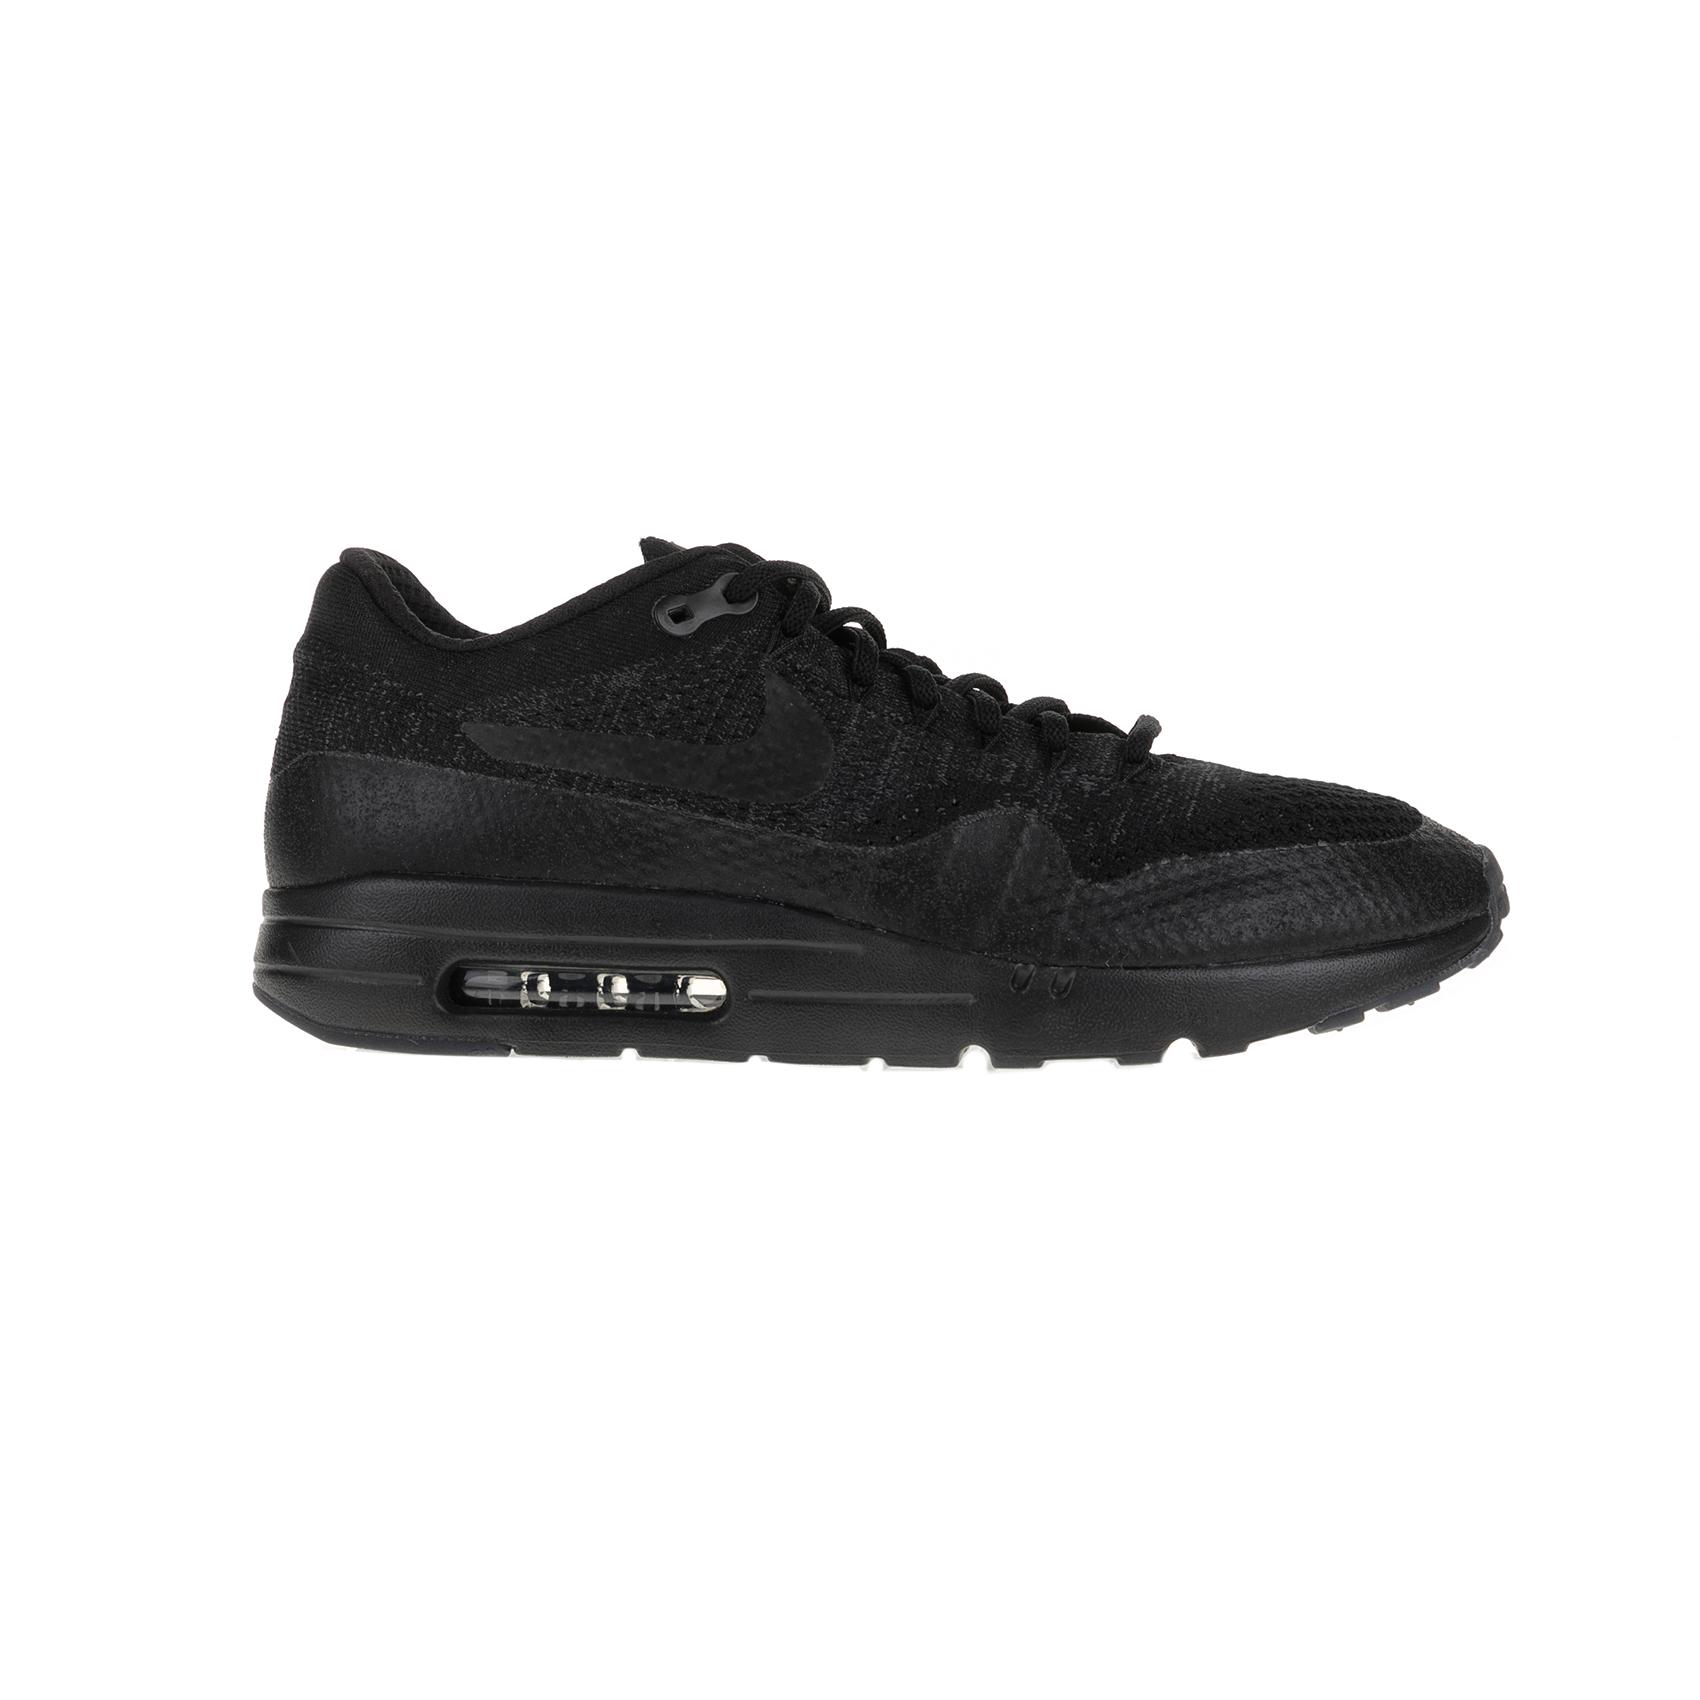 NIKE – Ανδρικά αθλητικά παπούτσια Nike AIR MAX 1 ULTRA FLYKNIT Z μαύρα